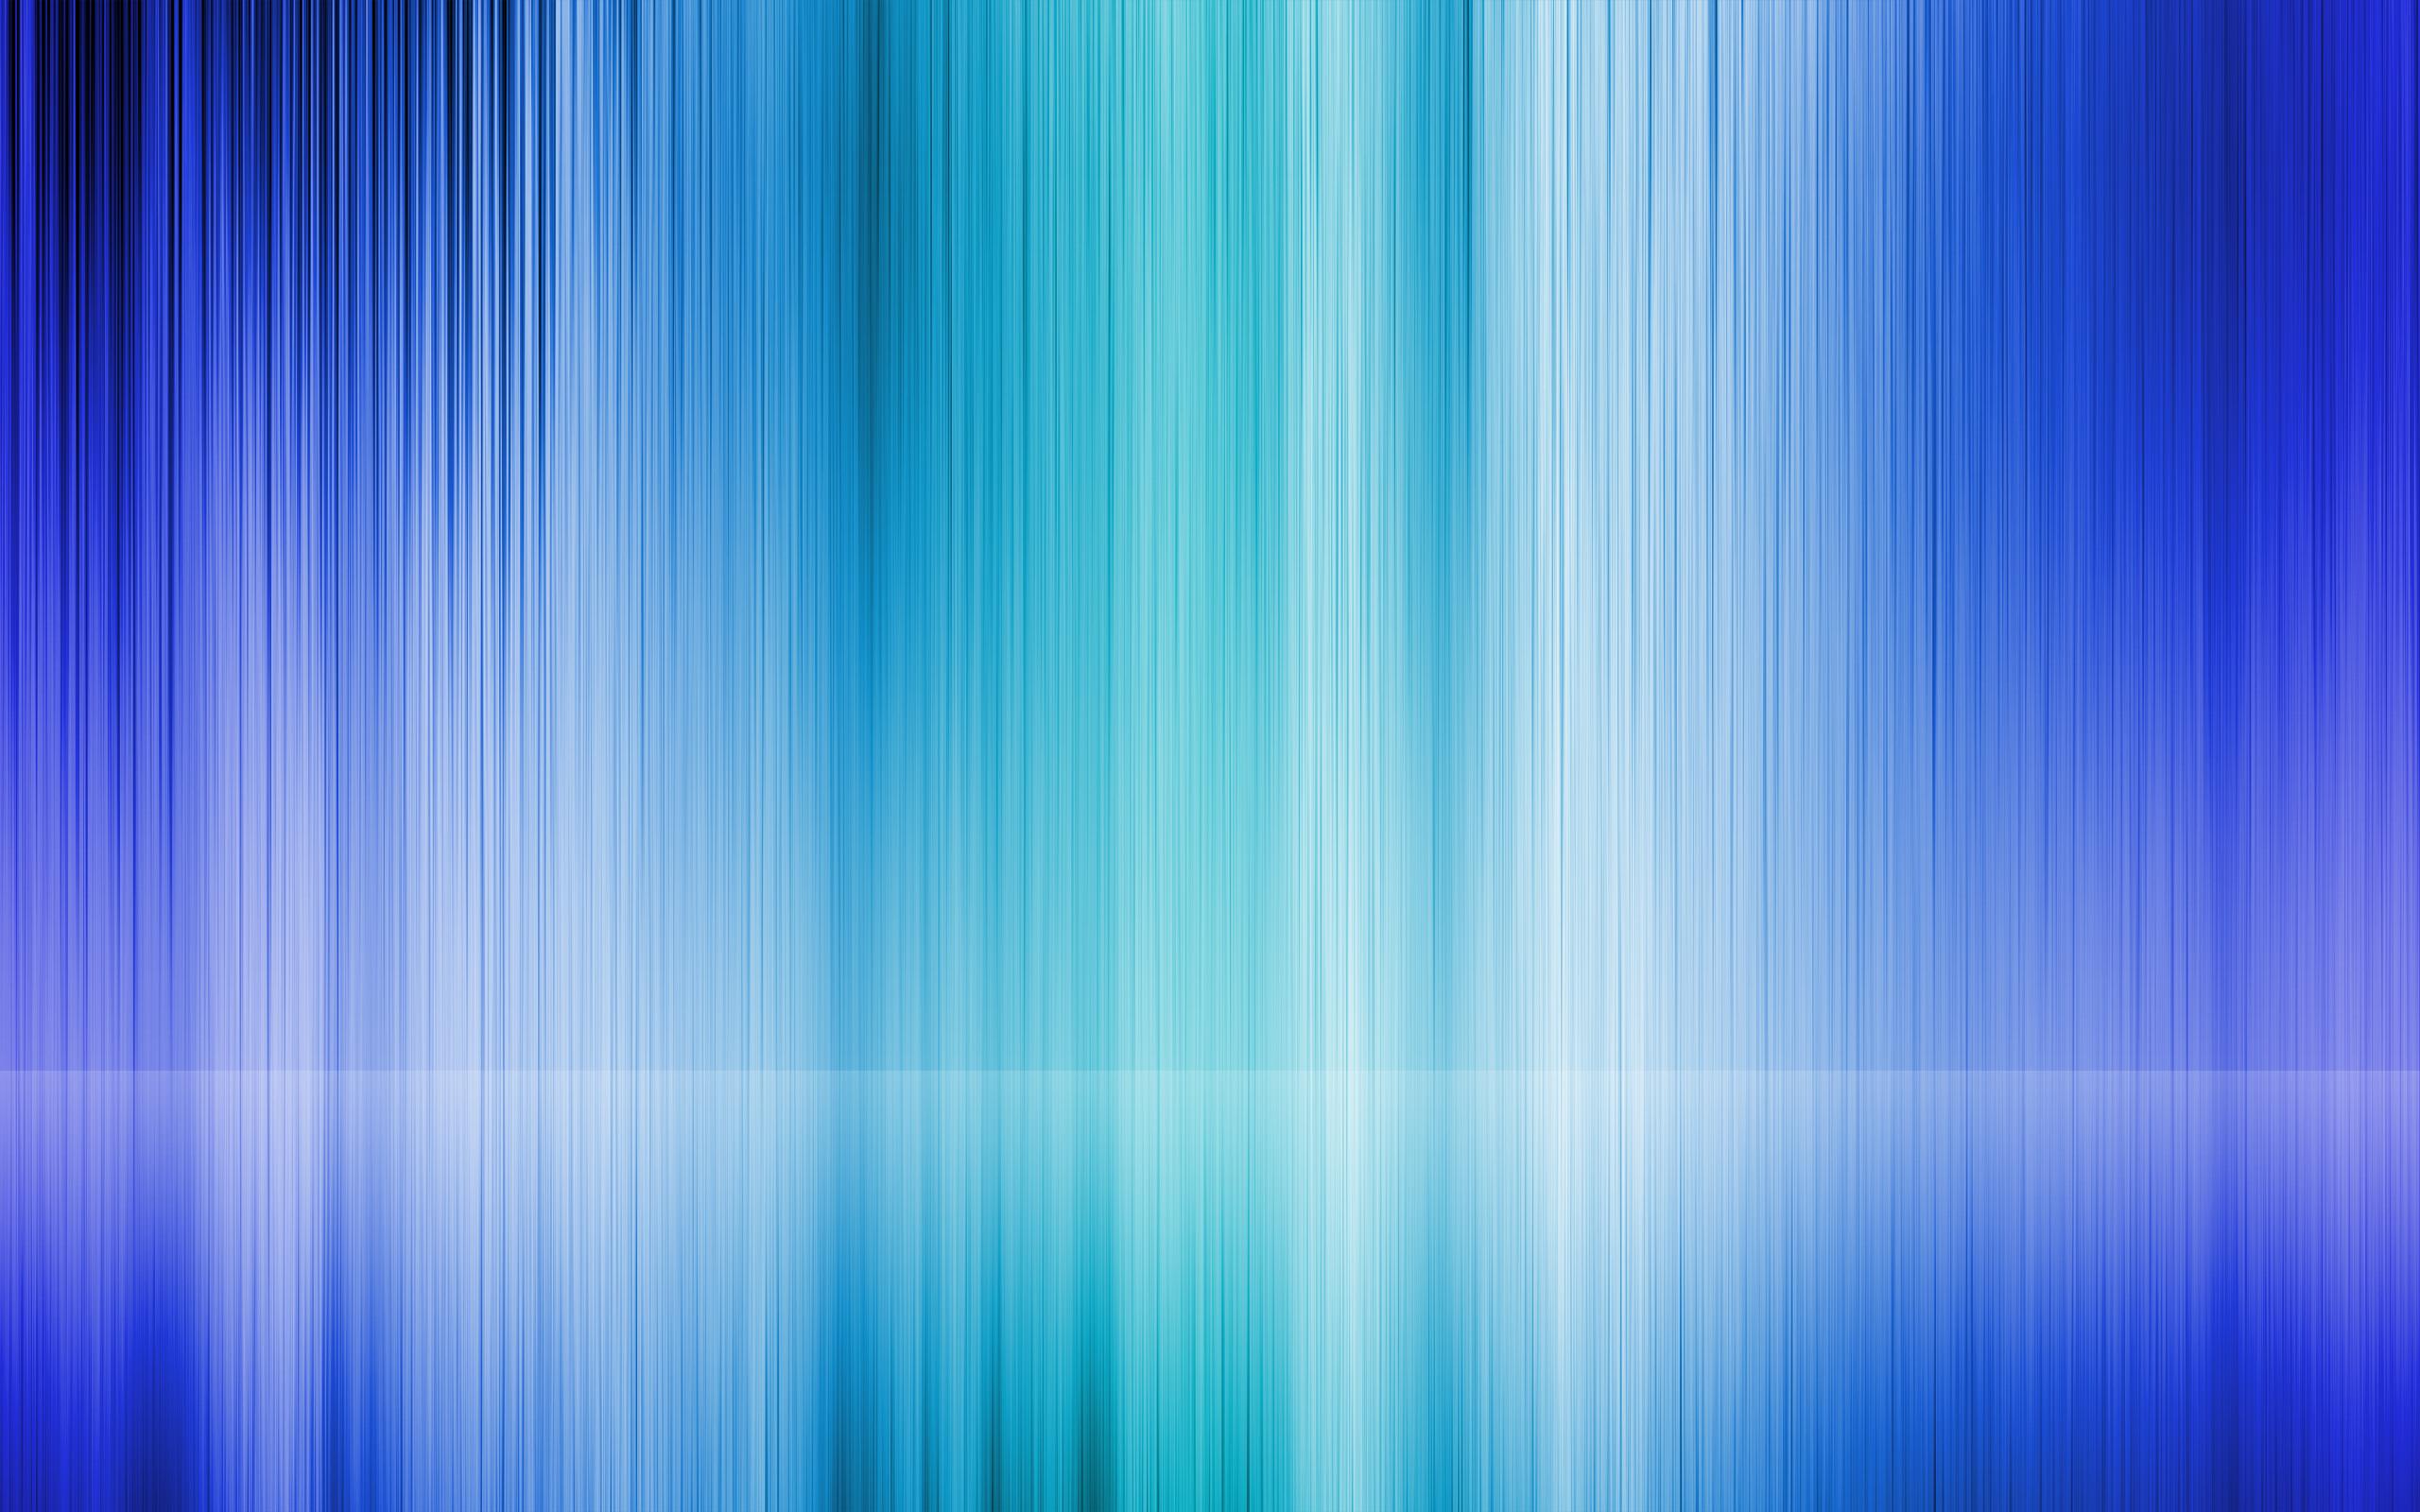 Cute Light Blue Wallpaper - WallpaperSafari